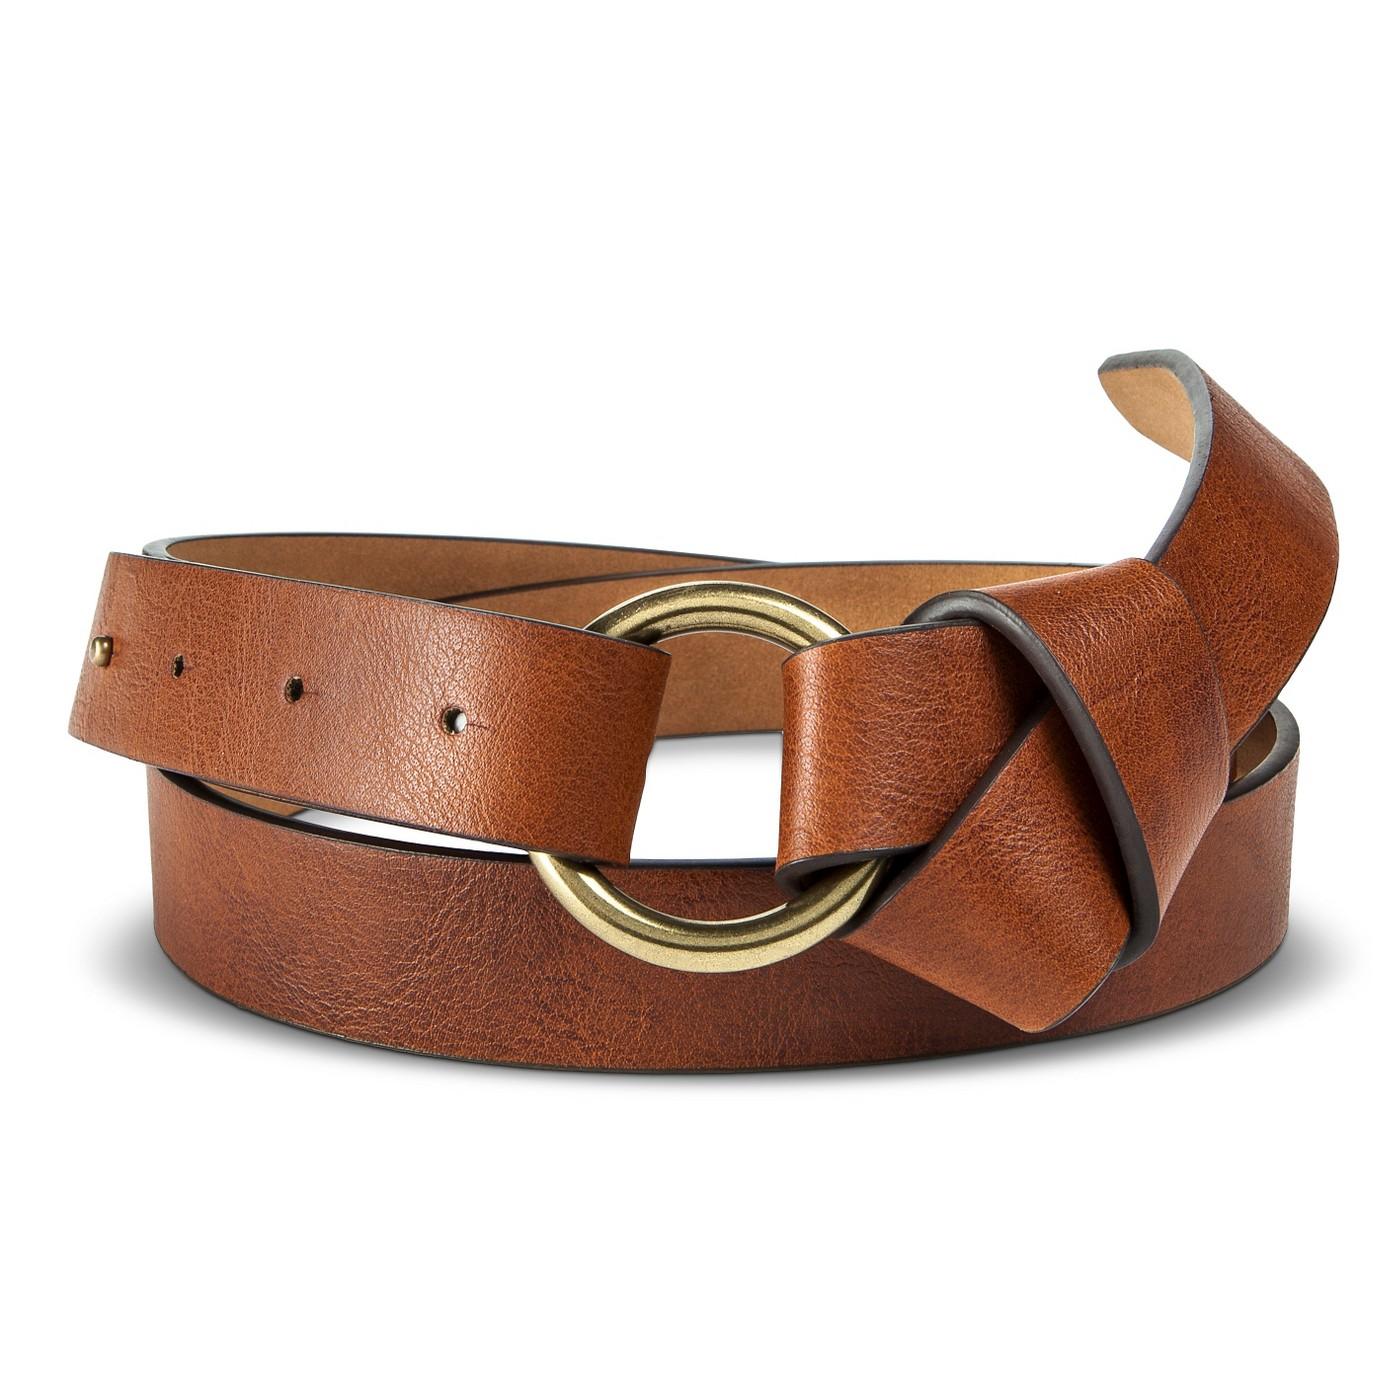 spotted maxi - target knot belt.jpg